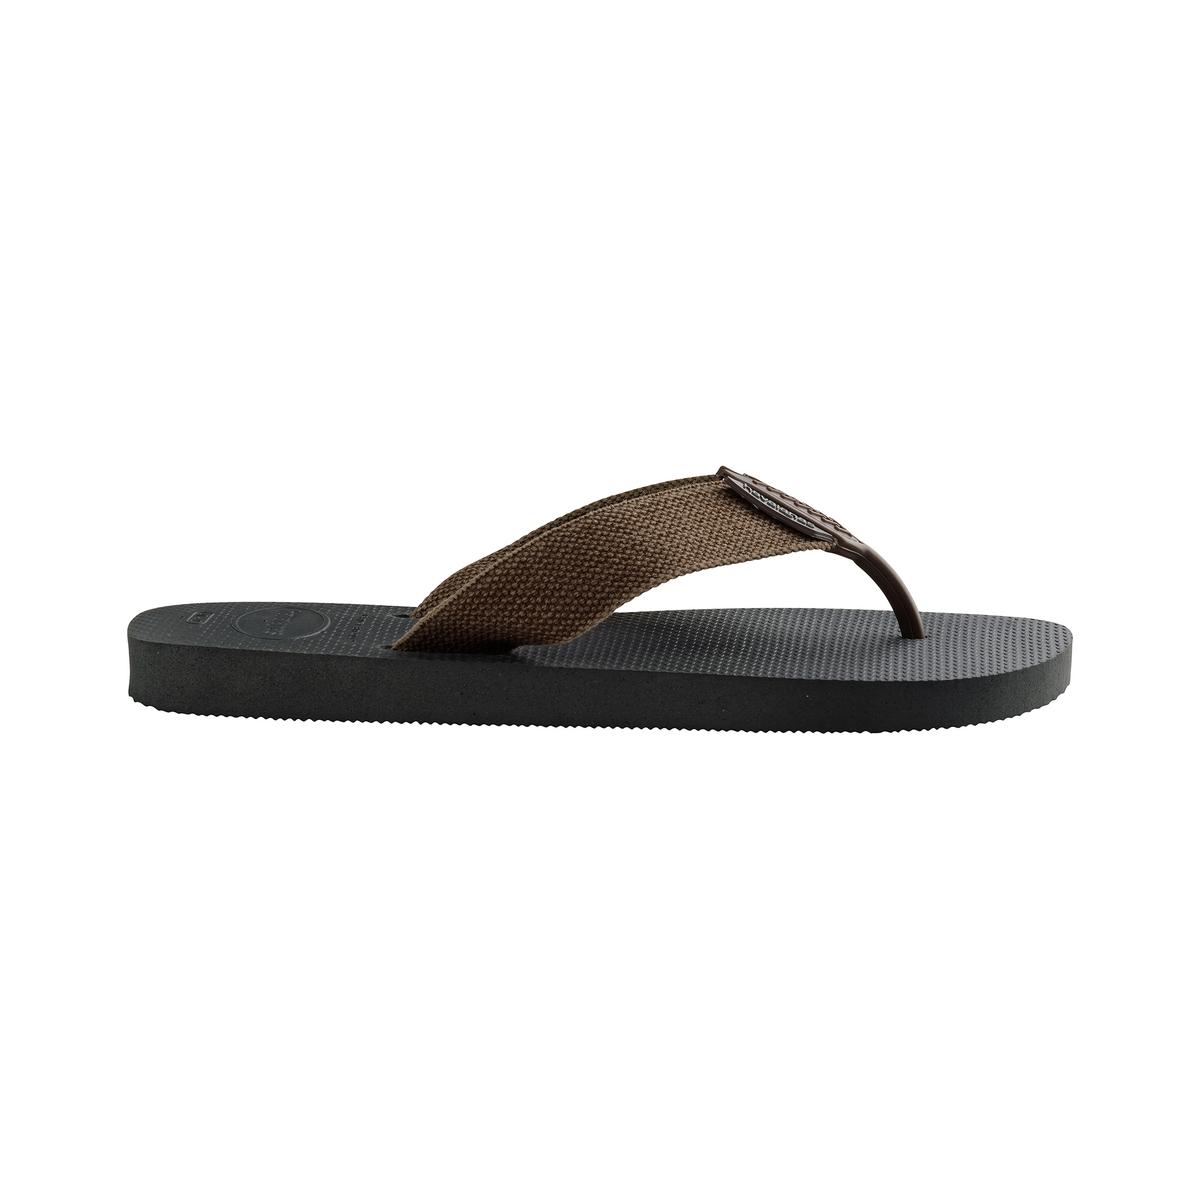 Вьетнамки Urban BasicВерх : каучук   Стелька : каучук   Подошва : каучук   Форма каблука : плоский каблук   Мысок : открытый мысок   Застежка : без застежки<br><br>Цвет: серый<br>Размер: 45/46.41/42